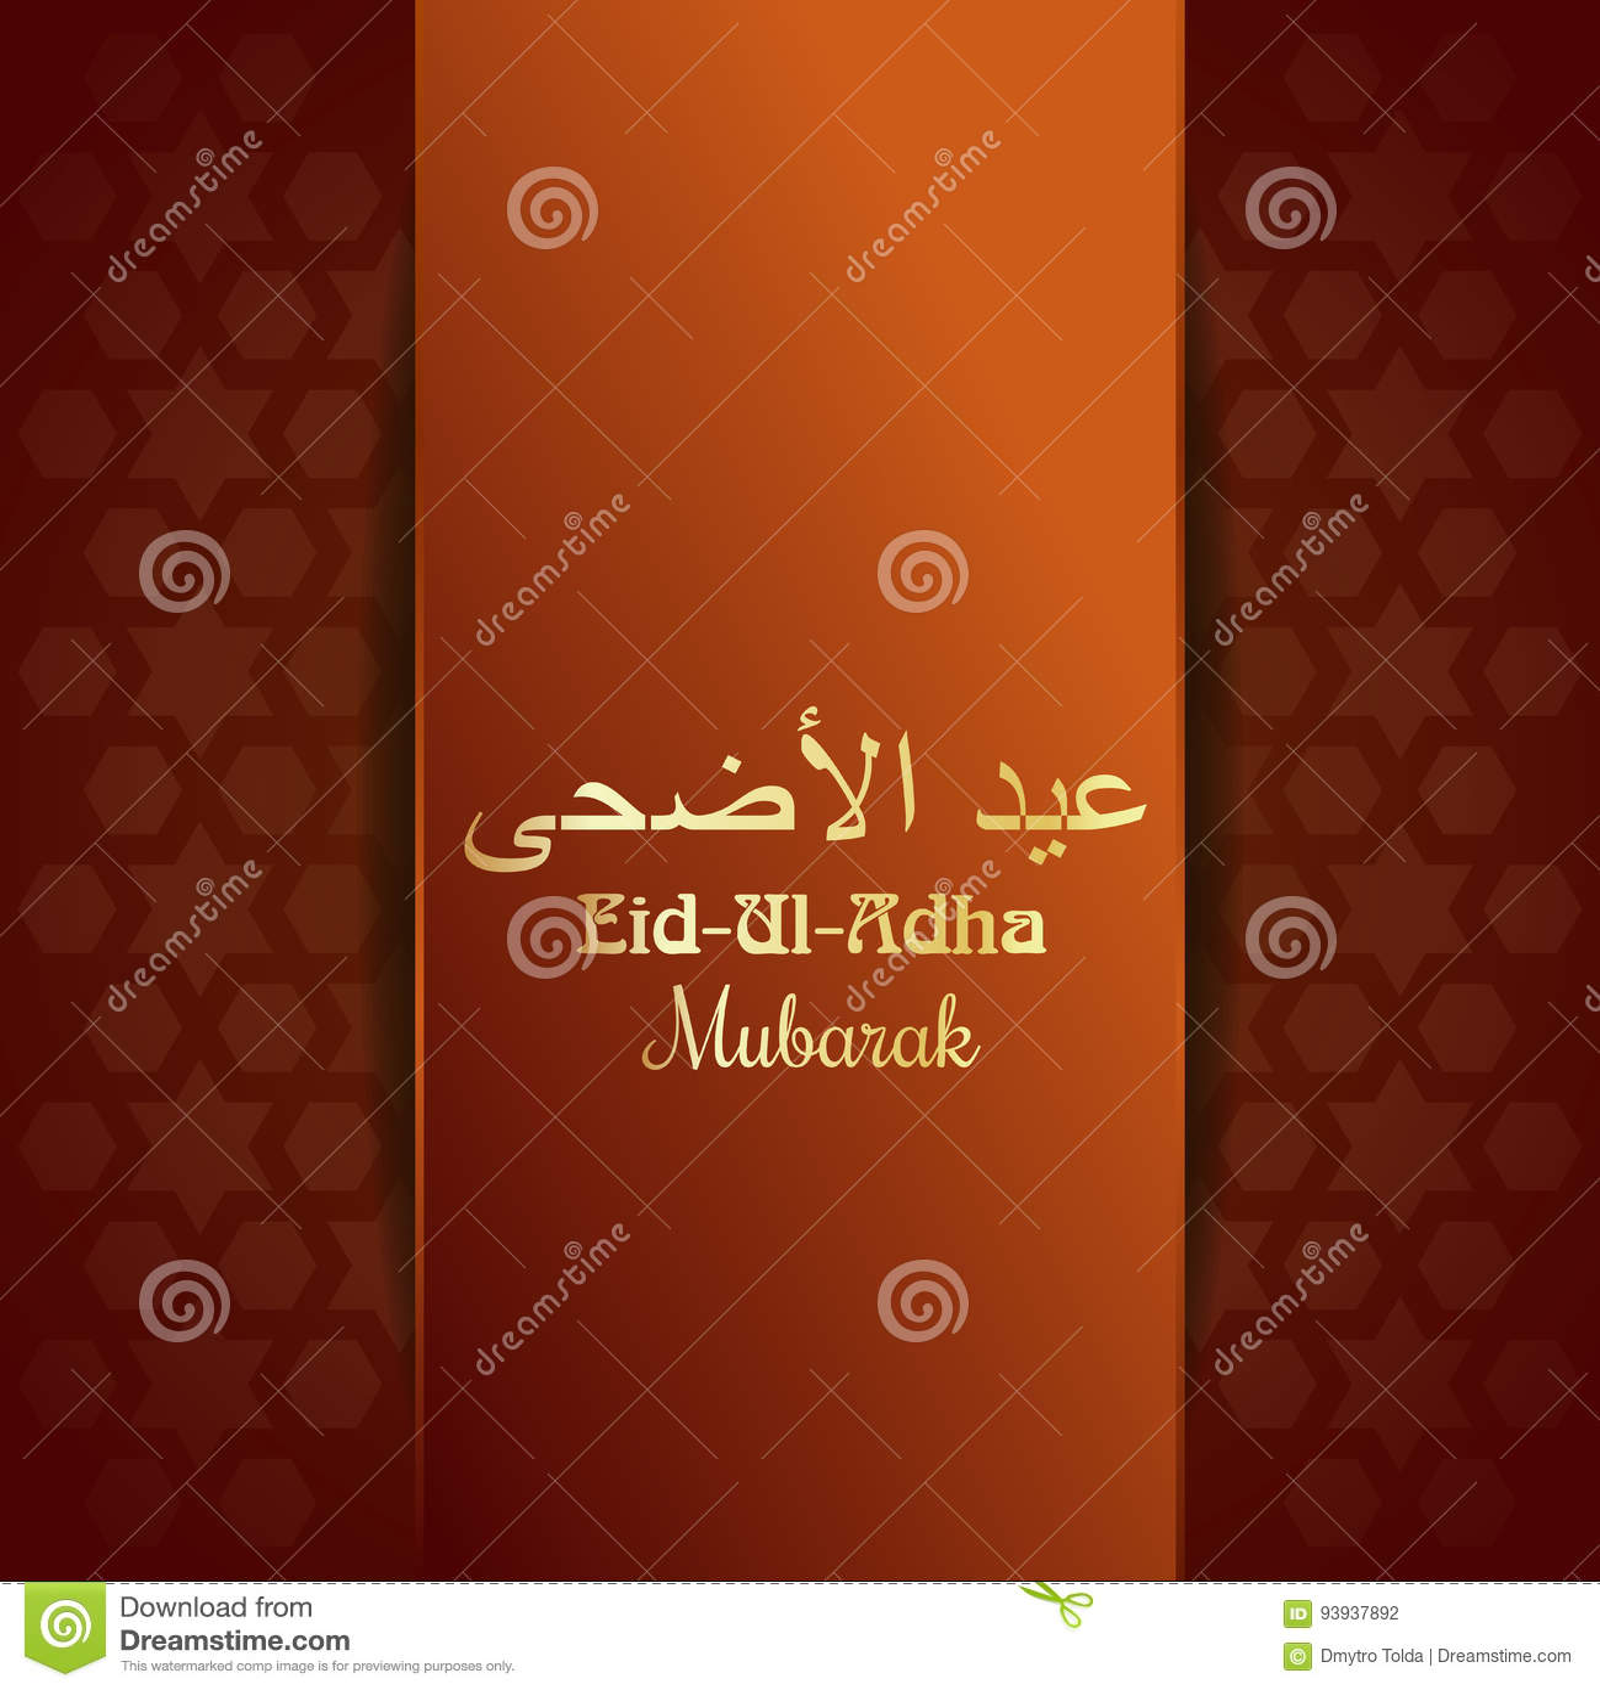 eiduladha mubarak greeting card islamic design stock